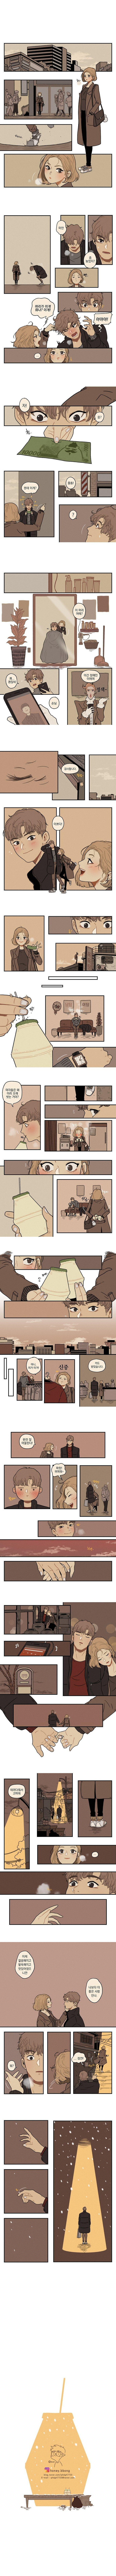 i14124837047.jpg 여자친구가 이발하라고 만원을 줬다.manhwa